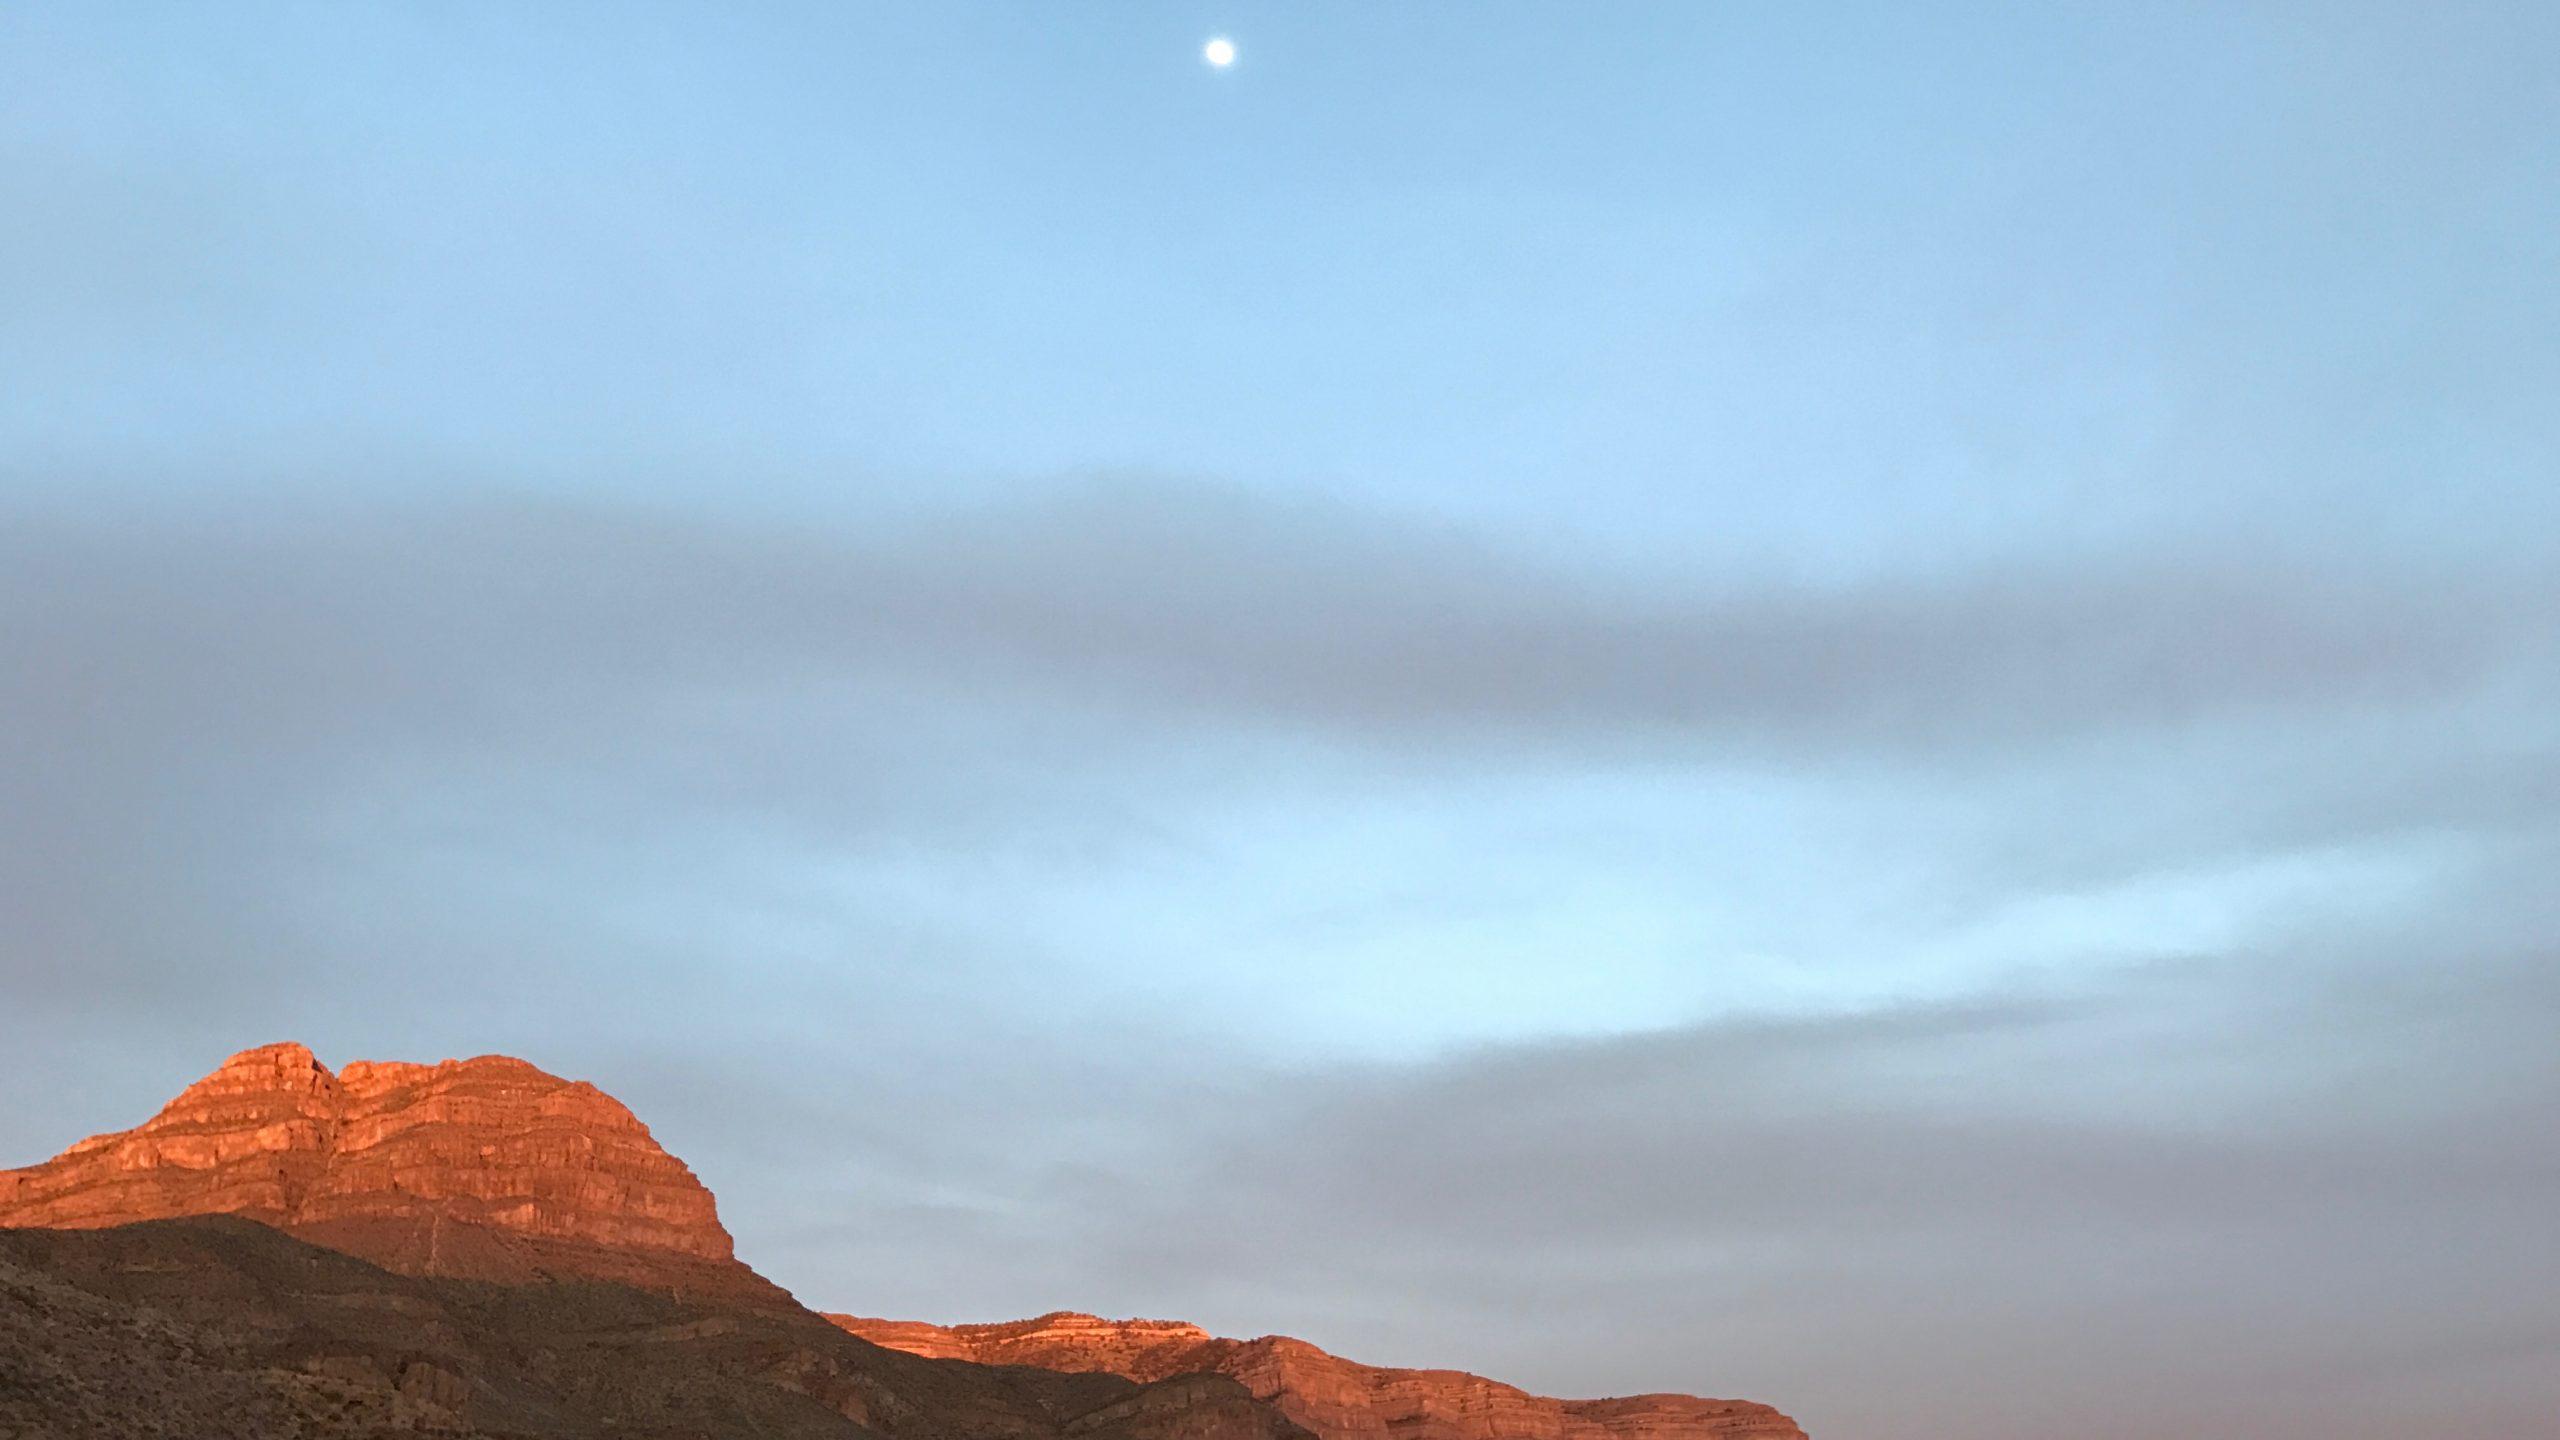 Sacramento Mountains Sunset in New Mexico